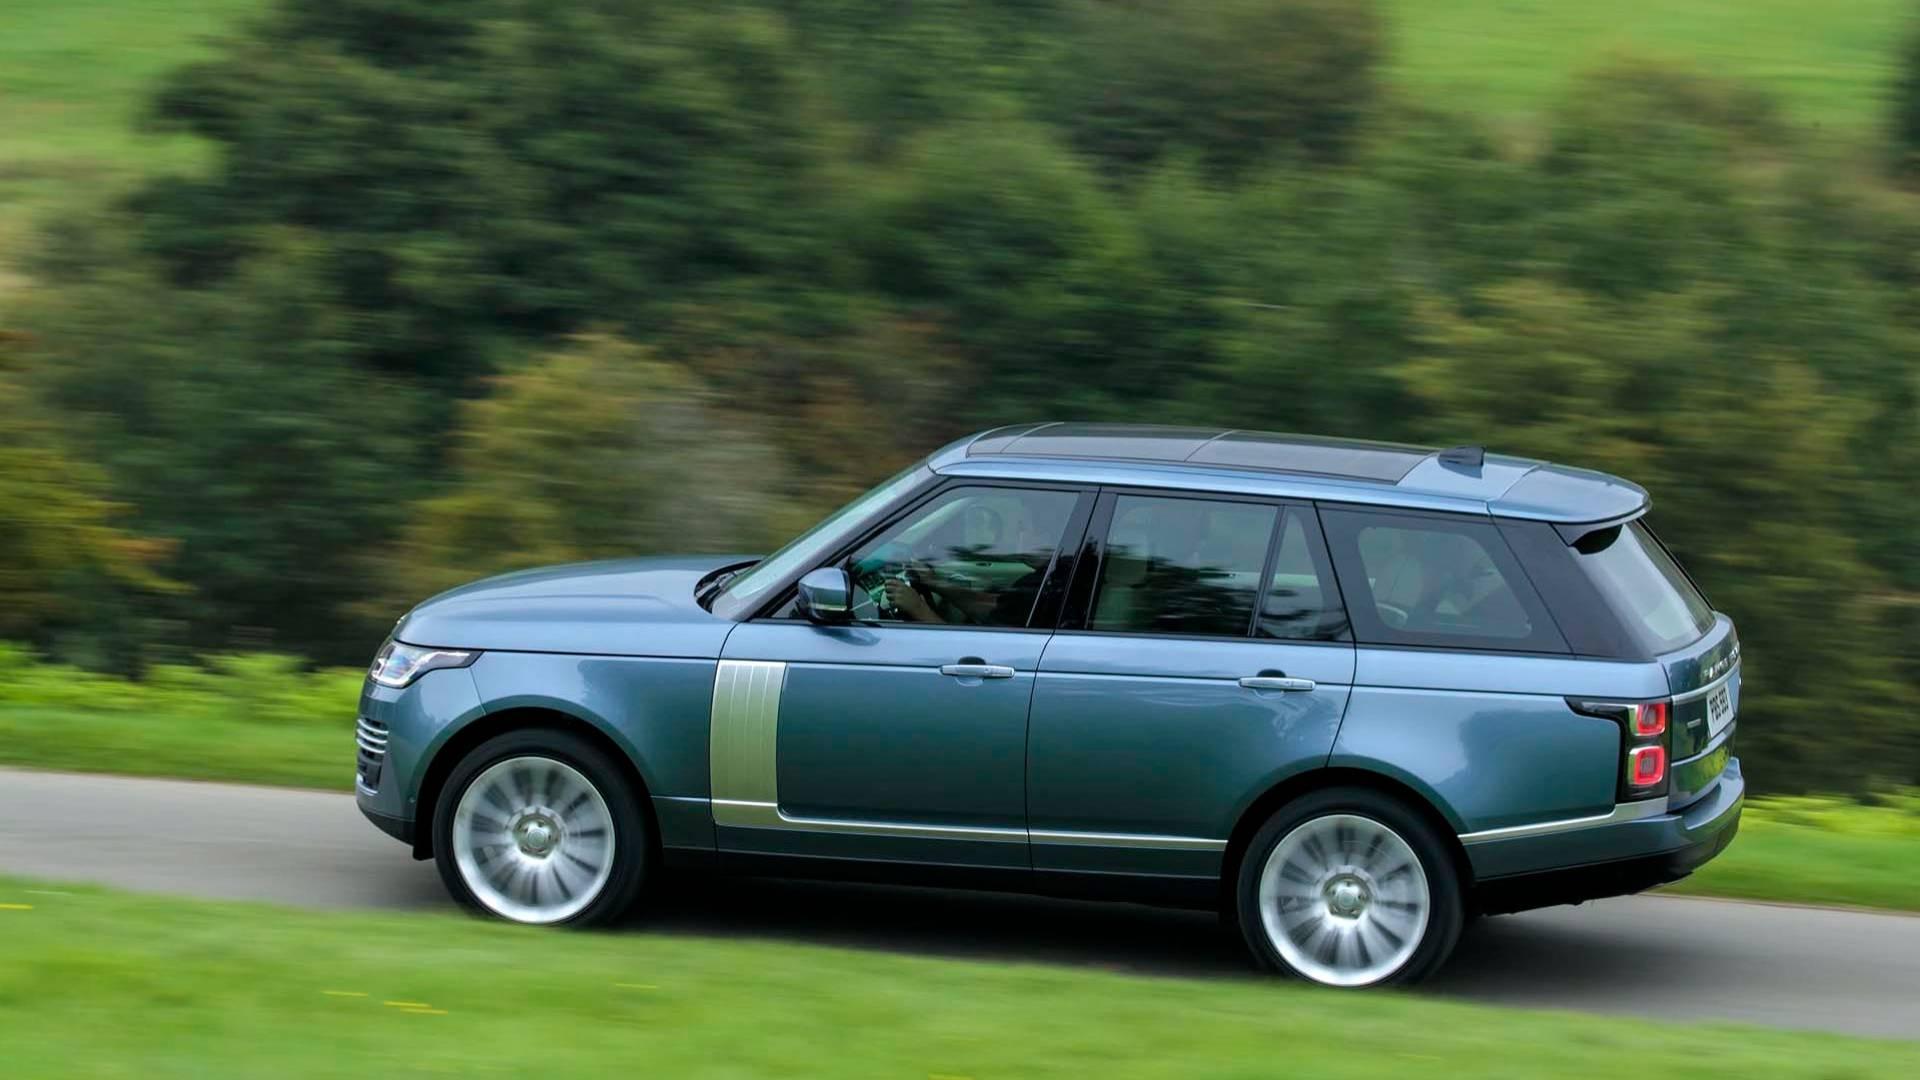 Range Rover 2018 — фотогалерея